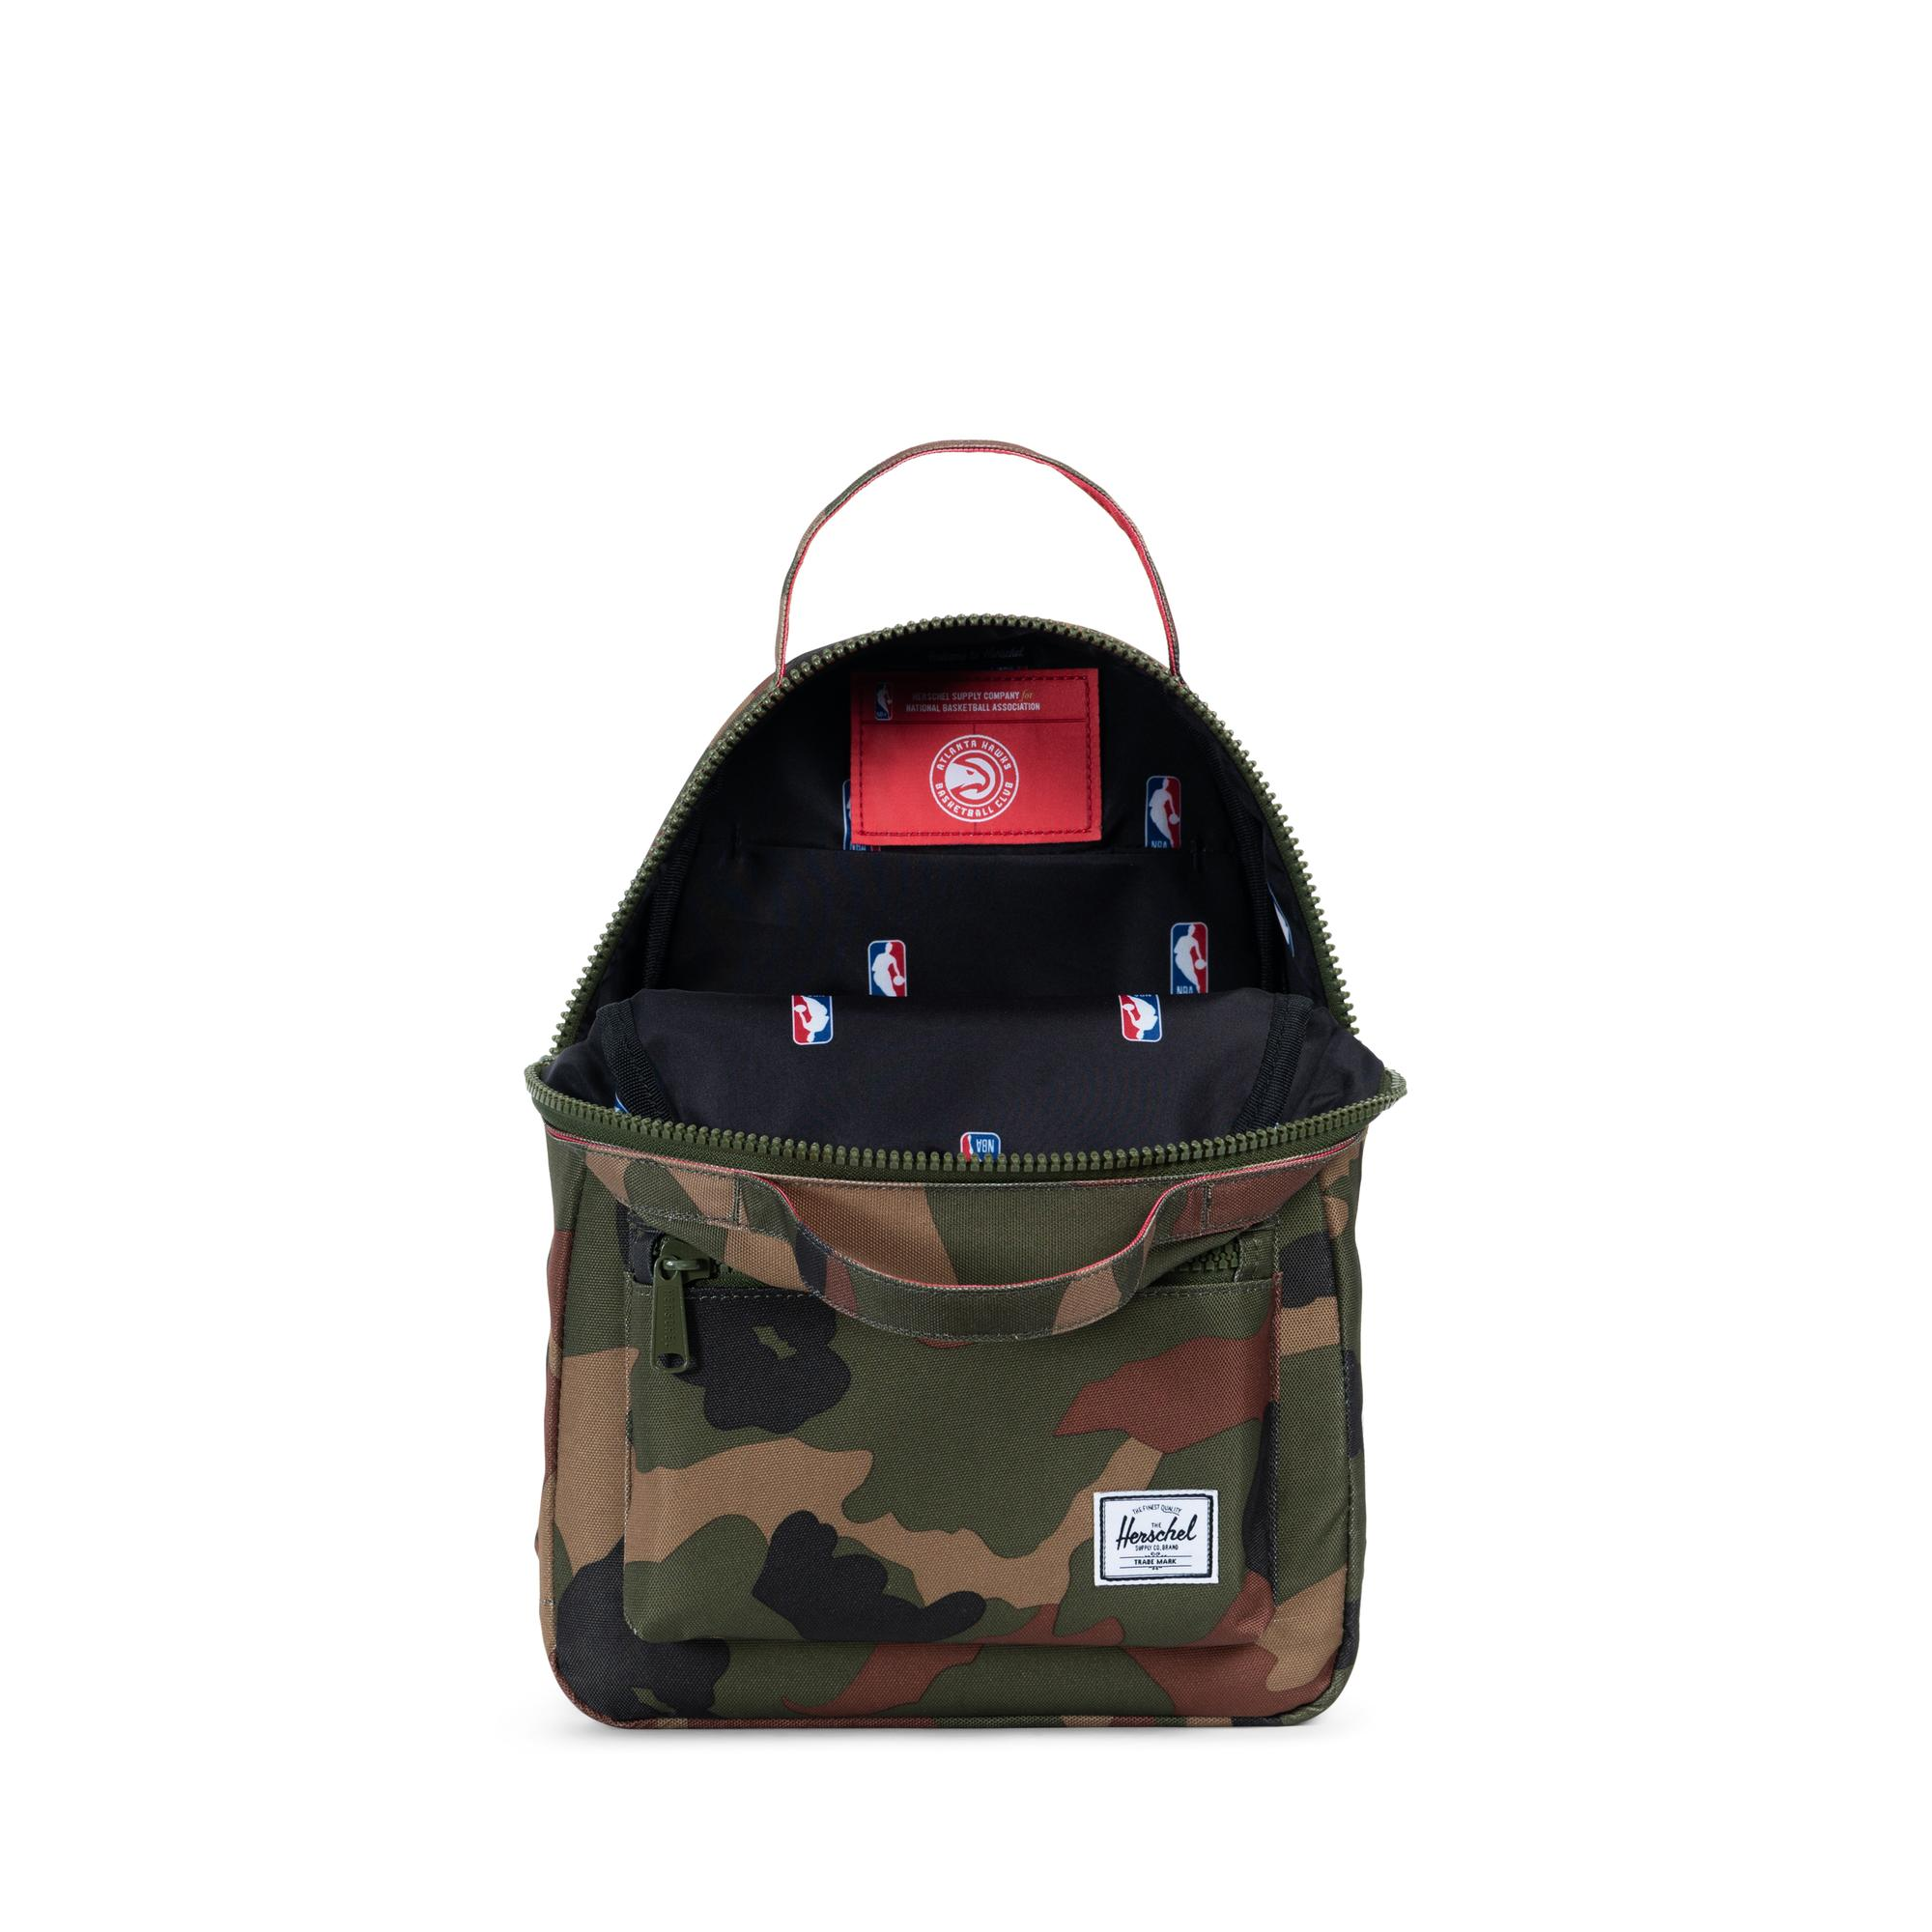 aff88b786834 Nova Backpack Small NBA Superfan